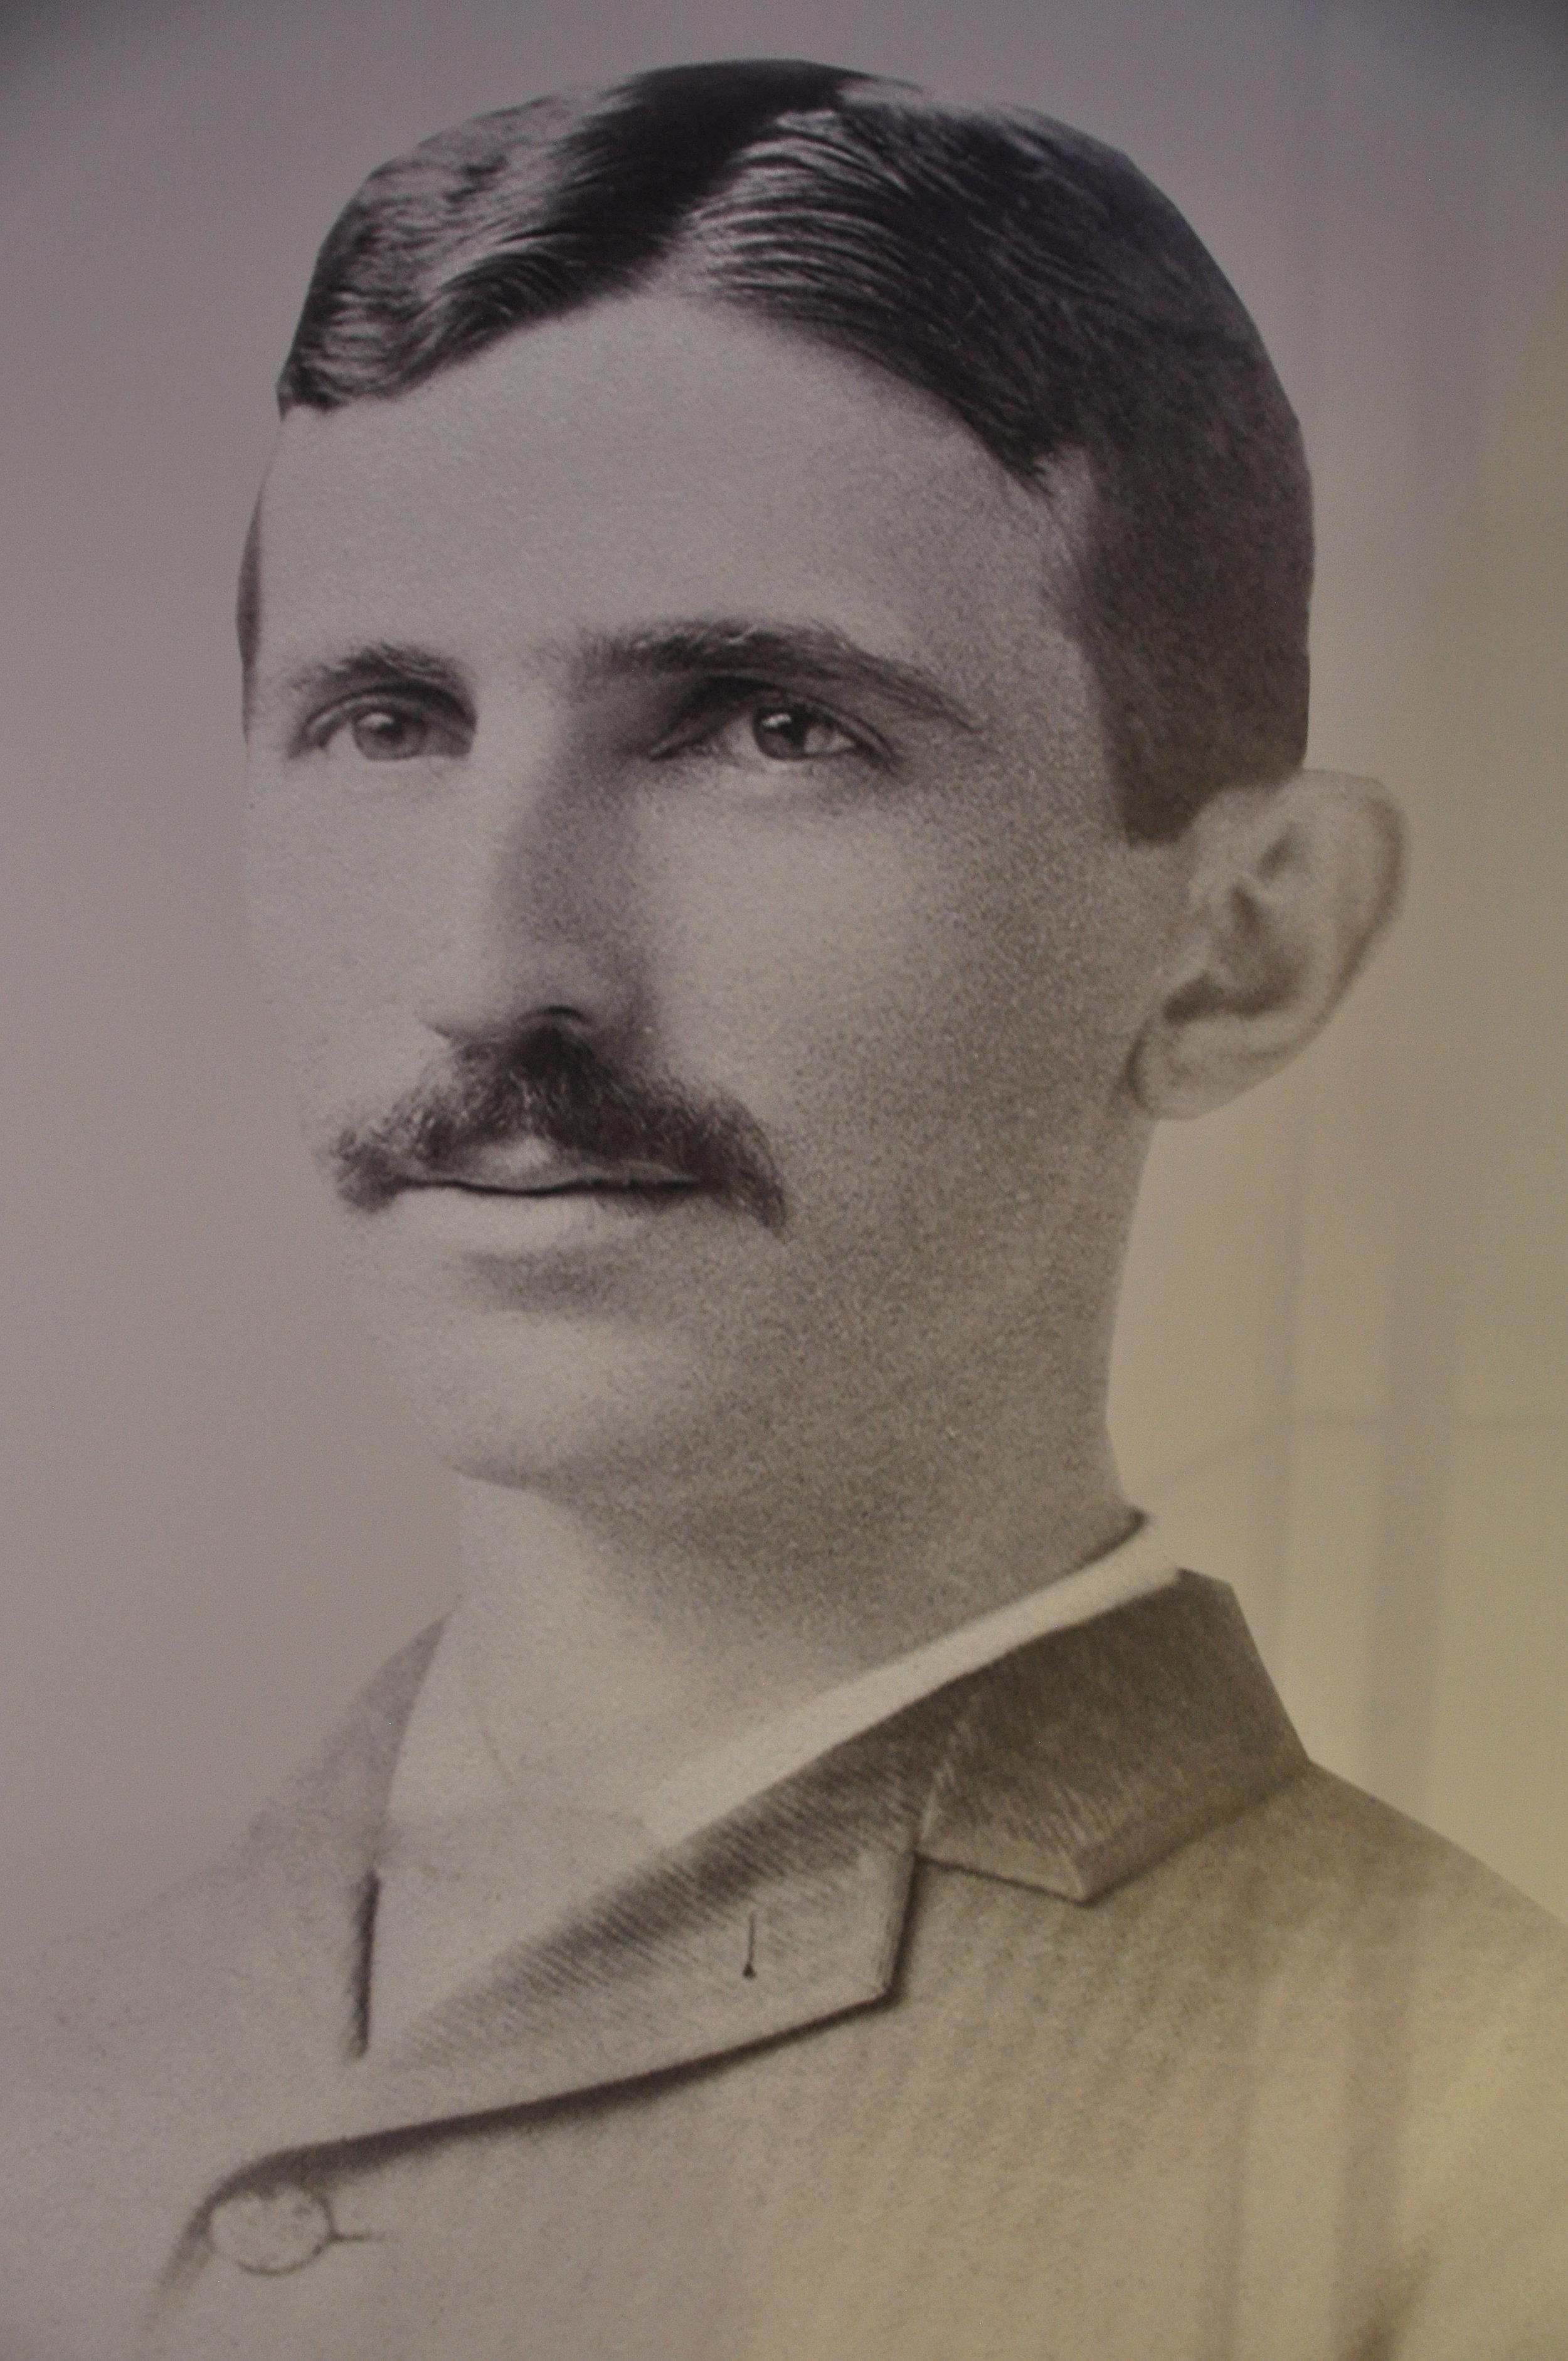 A portrait of Tesla at the Nikola Tesla Museum, Belgrade